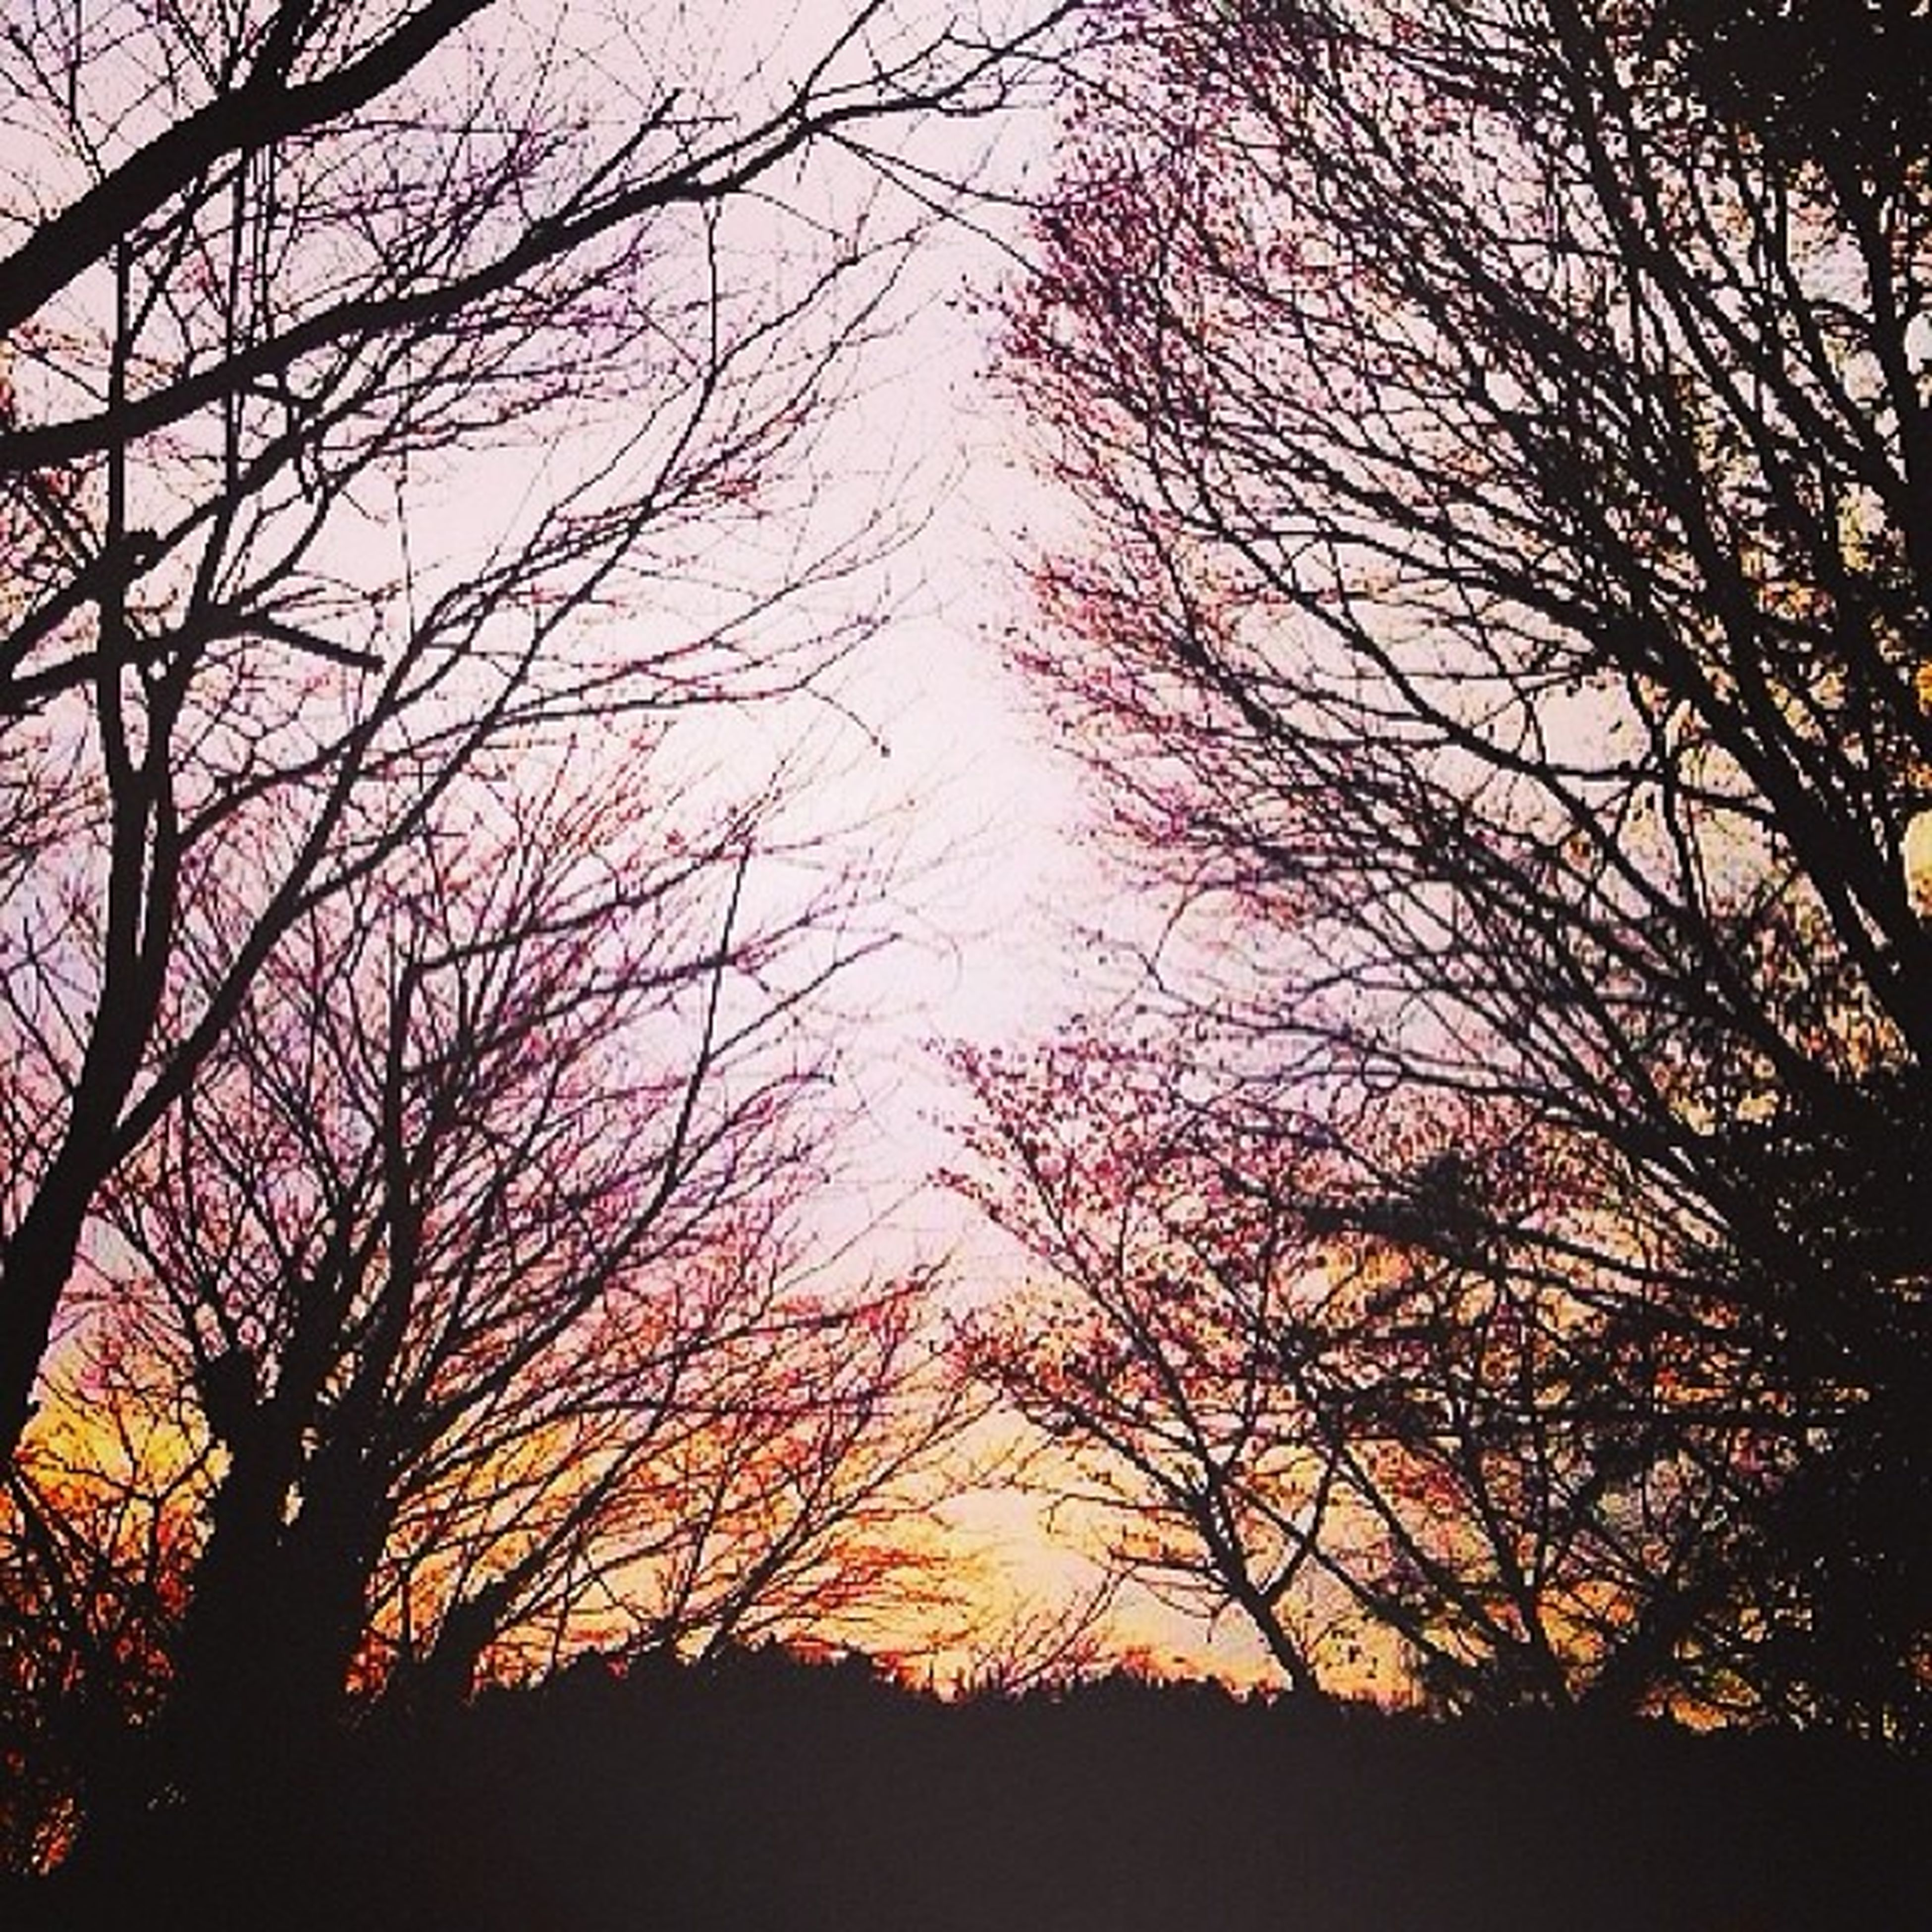 silhouette, sunset, tree, bare tree, tranquility, tranquil scene, branch, scenics, beauty in nature, nature, sky, idyllic, orange color, landscape, outdoors, non-urban scene, growth, no people, sun, non urban scene